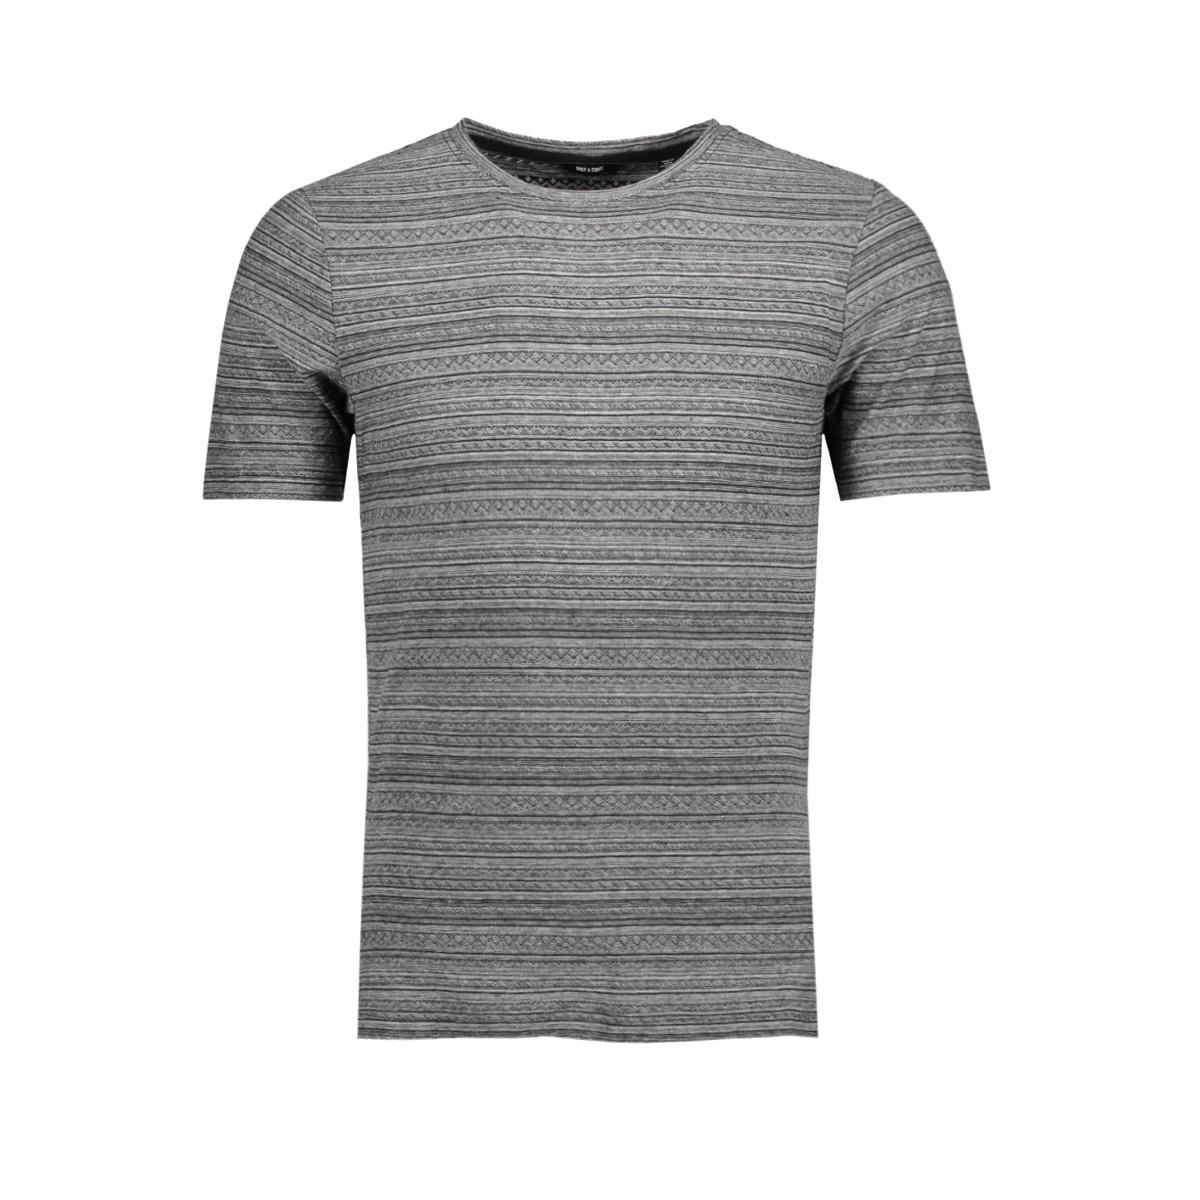 onsmarshall ss slim tee 22008023 only & sons t-shirt light grey melange